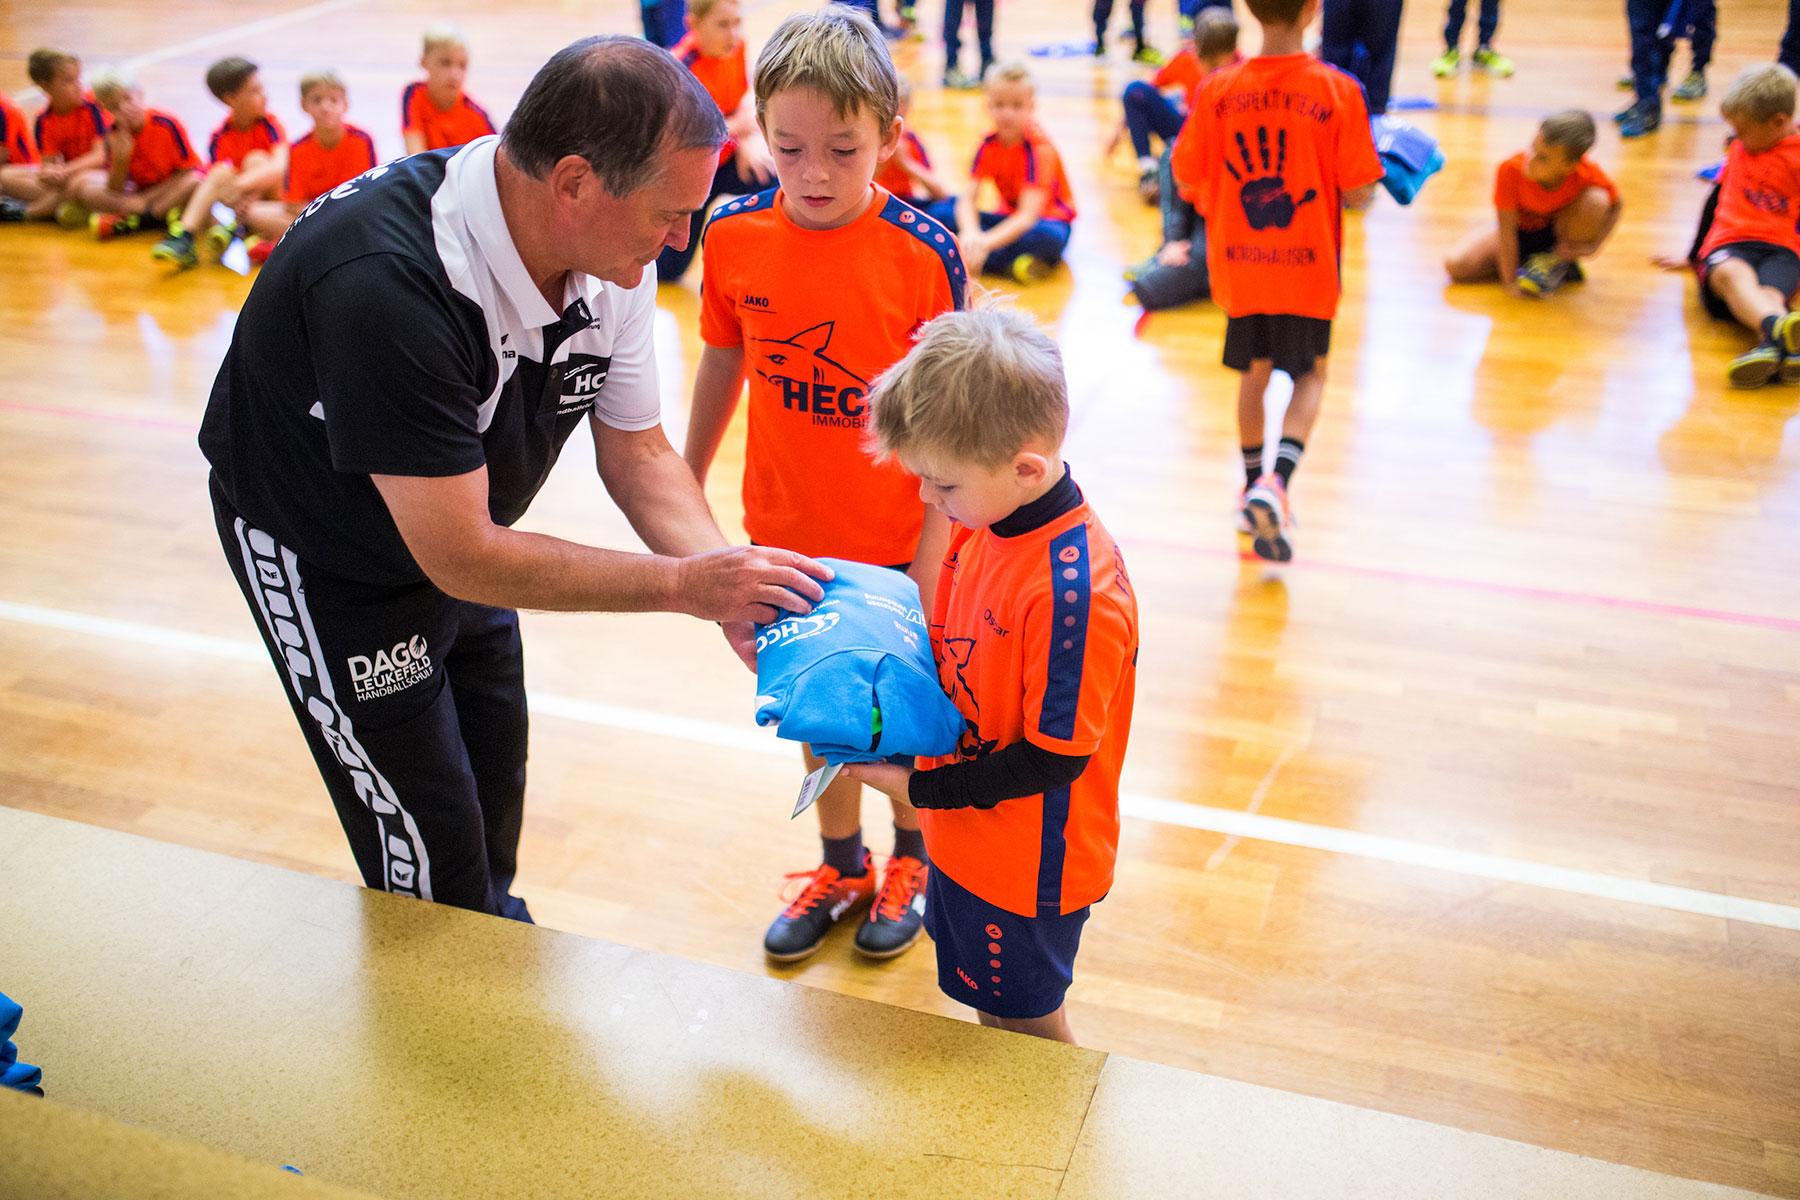 201809_Handballcamp_NDH (48)